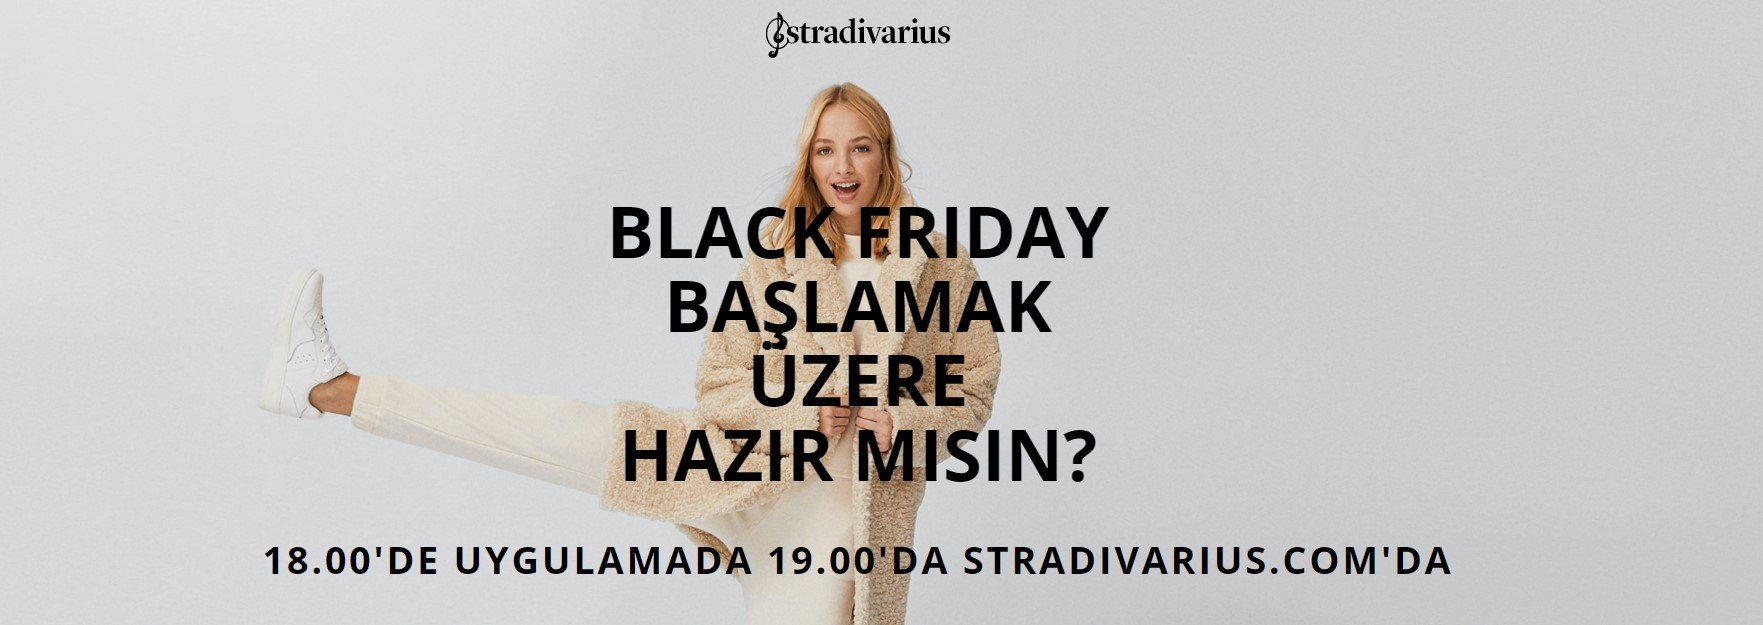 stradivarius black friday indirimi 2020